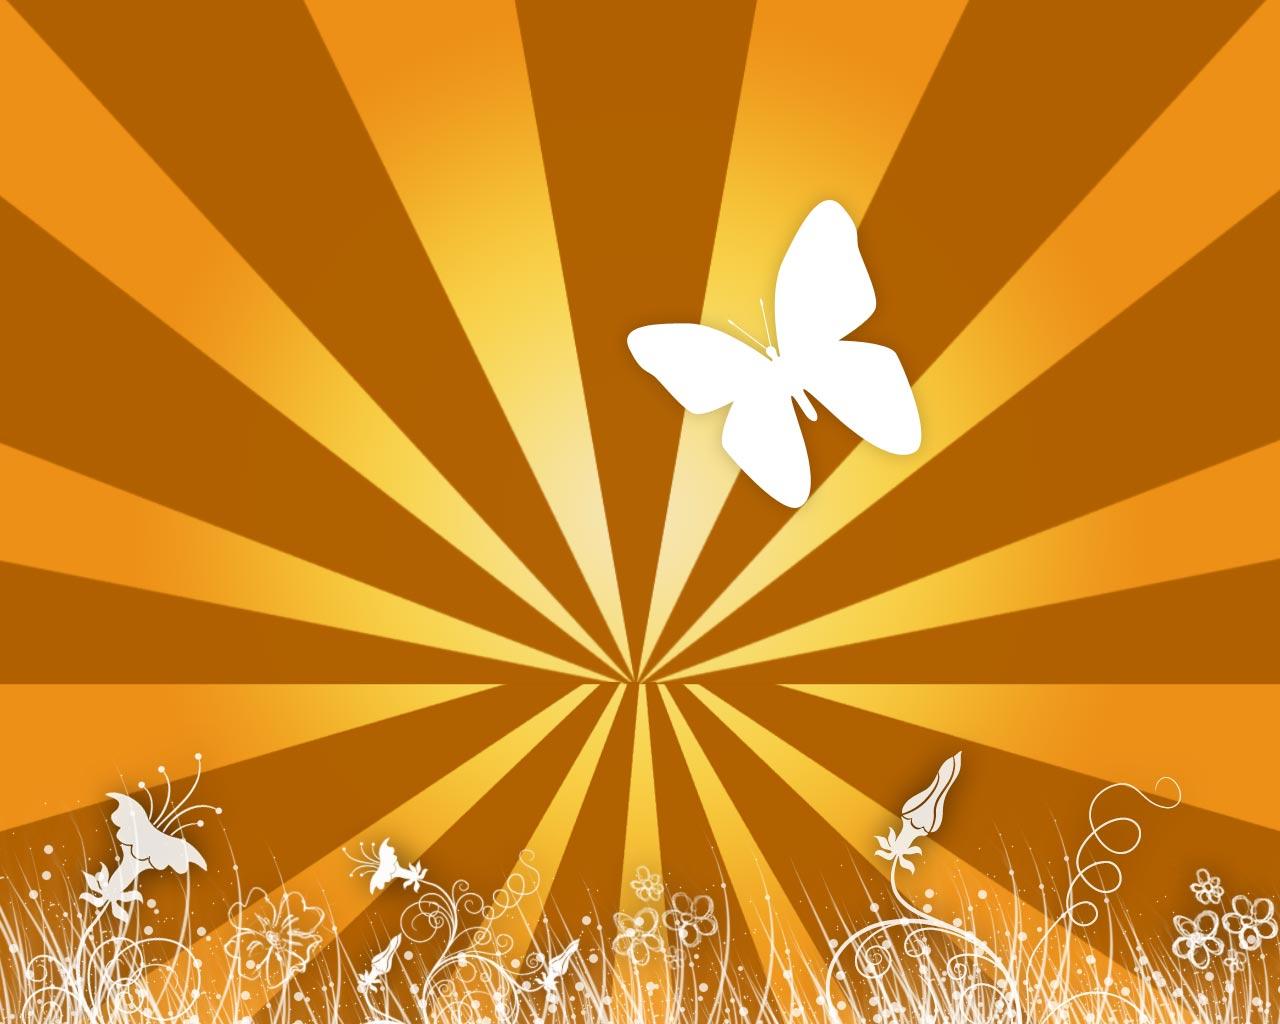 http://4.bp.blogspot.com/-pNuum8U7e6s/TWfEQDXOZoI/AAAAAAAAAw0/oTenIeXE8VQ/s1600/sunshine-and-flowers-free-wallpaper.jpg